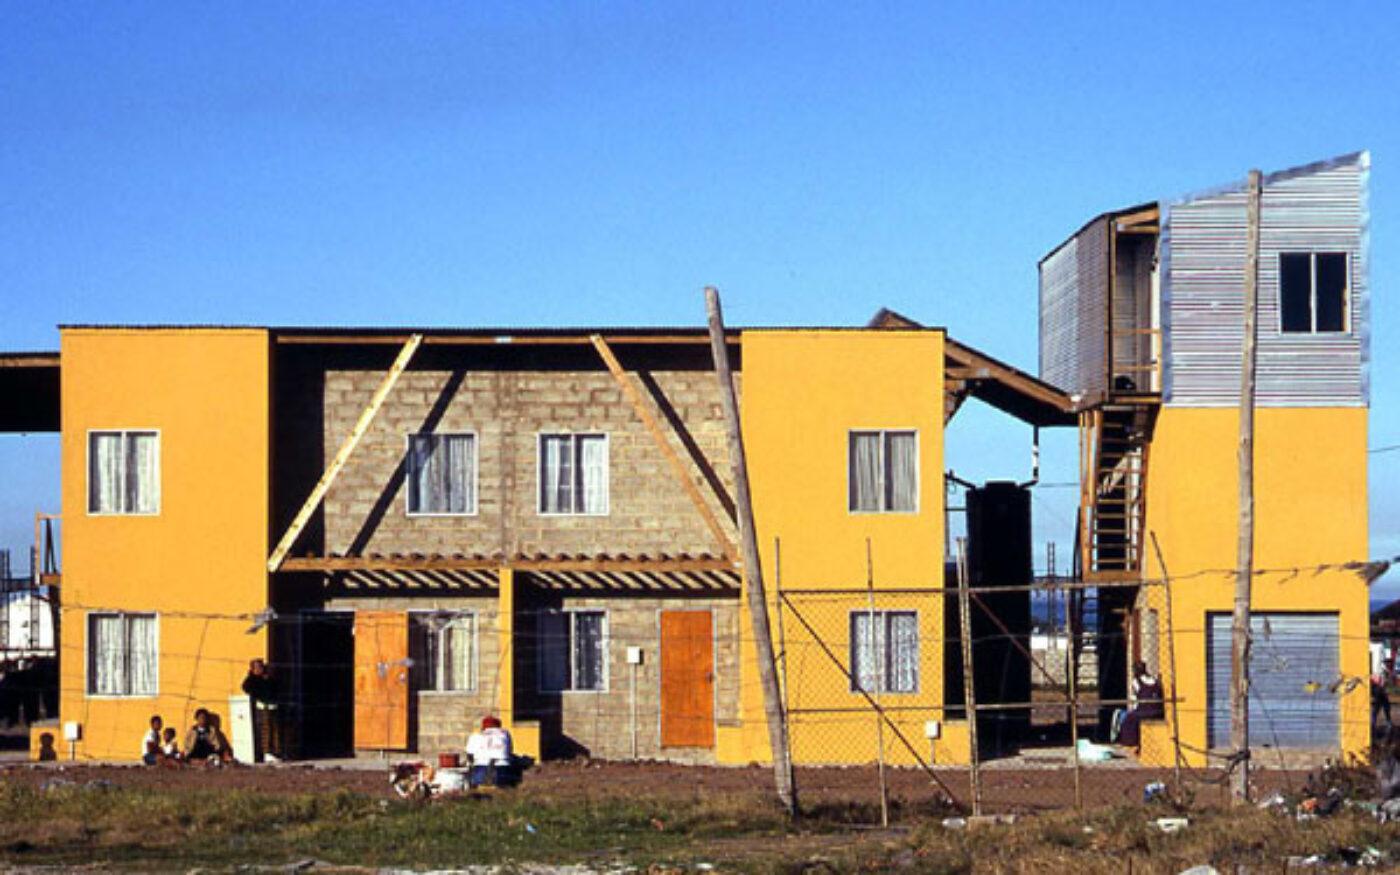 South Africa: Pelip Housing